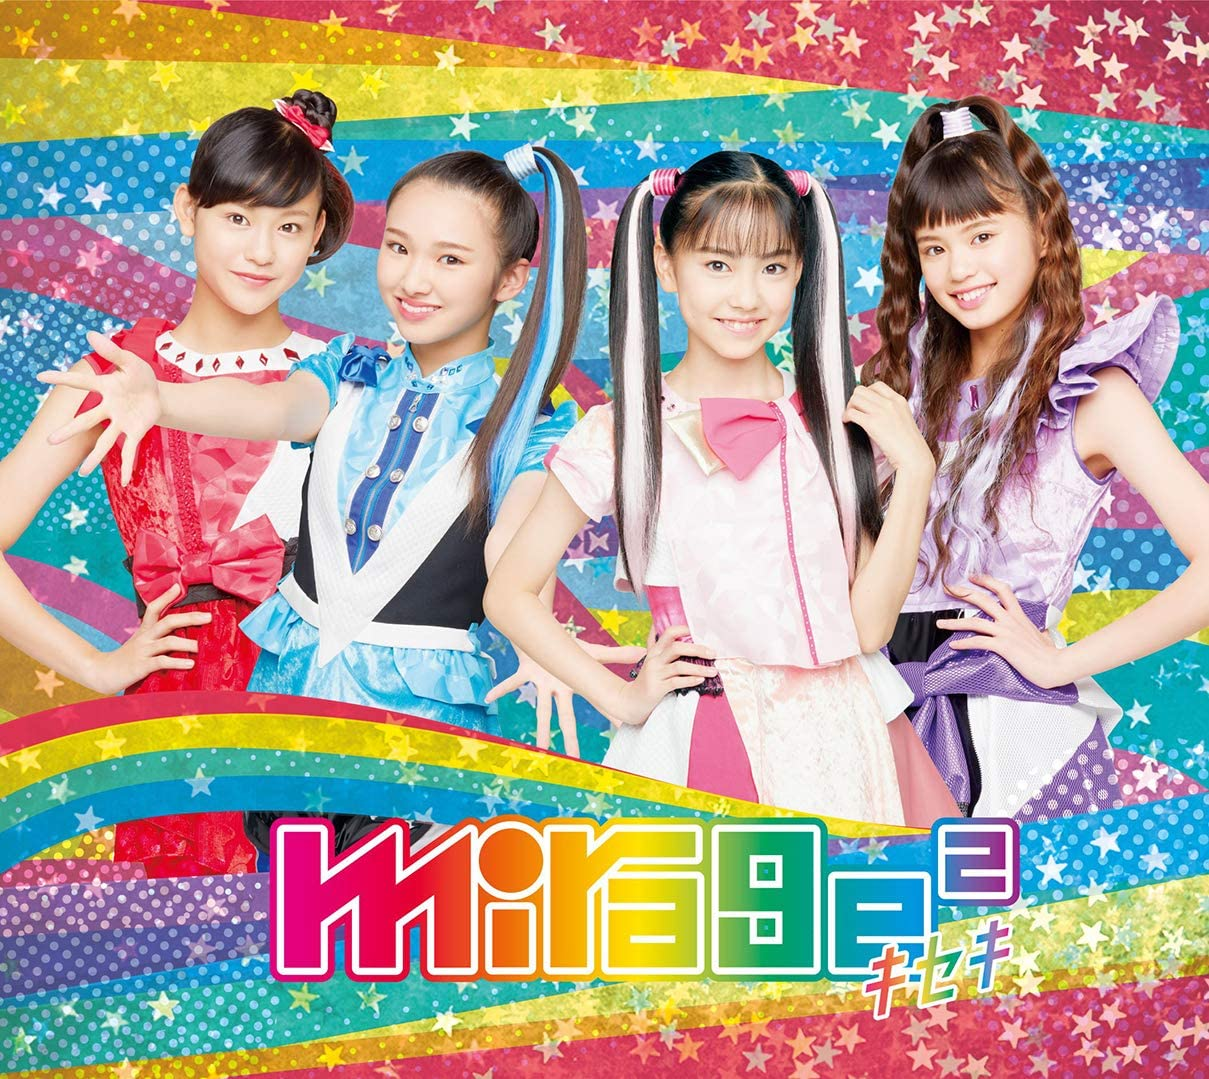 mirage2 「キセキ (初回生産限定盤) (DVD付) (デカジャケット付) 」